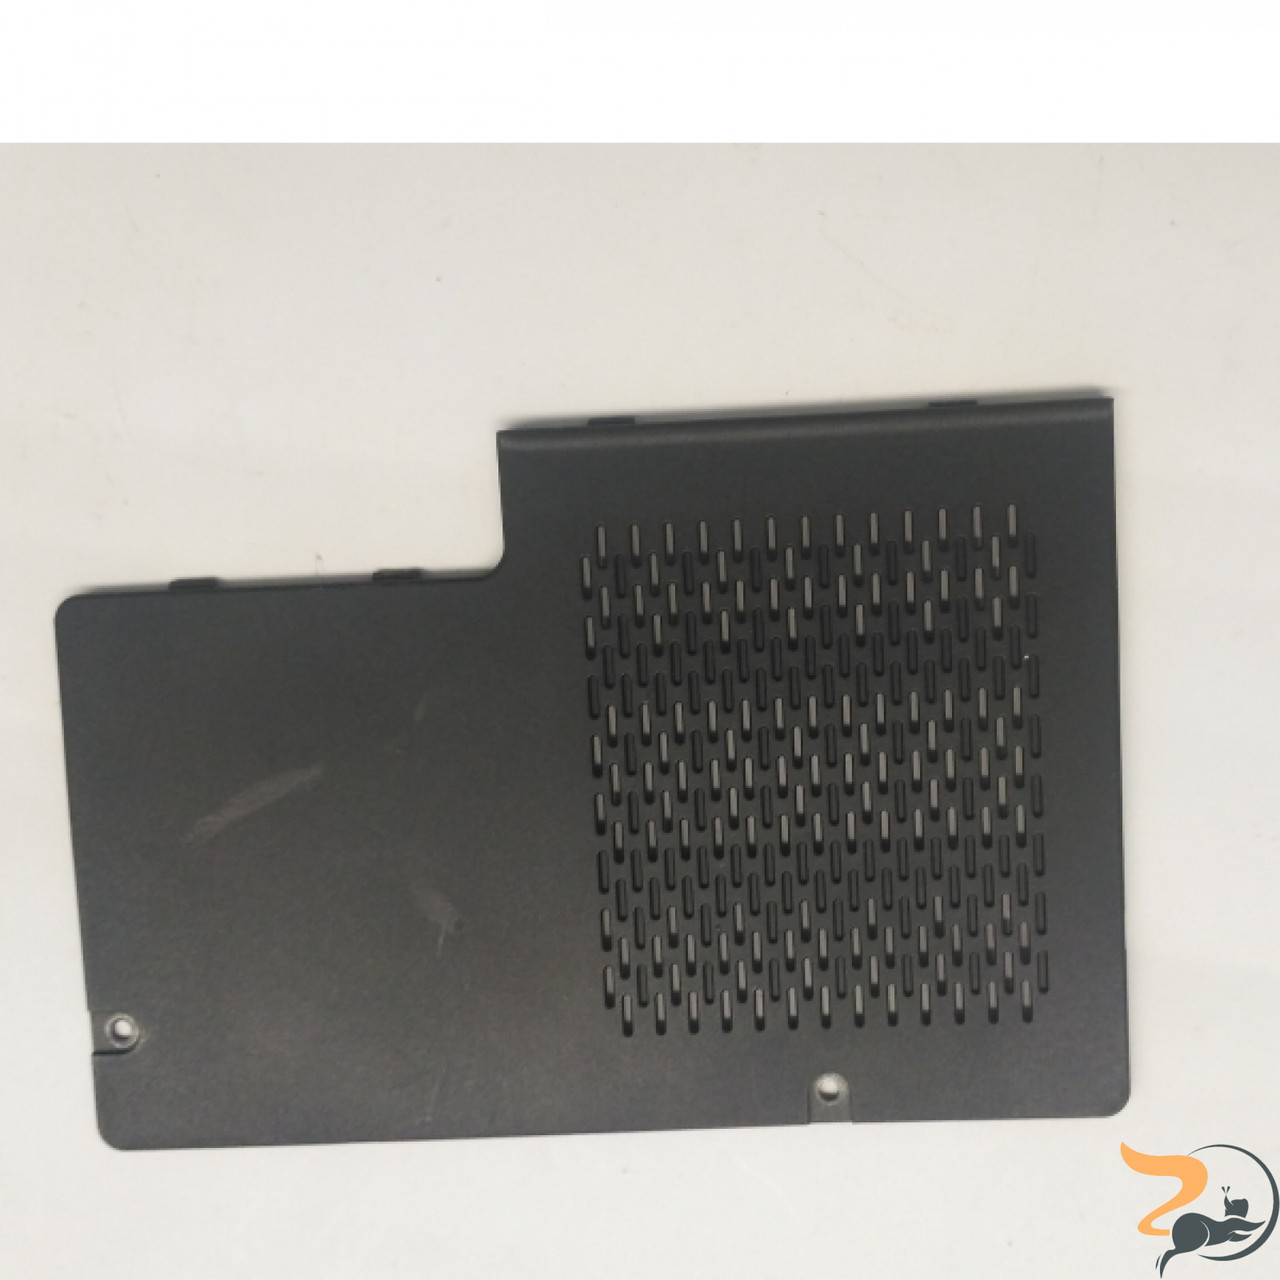 Сервісна кришка для ноутбука Asus Z9100, 13-NA51AP102, Б/В